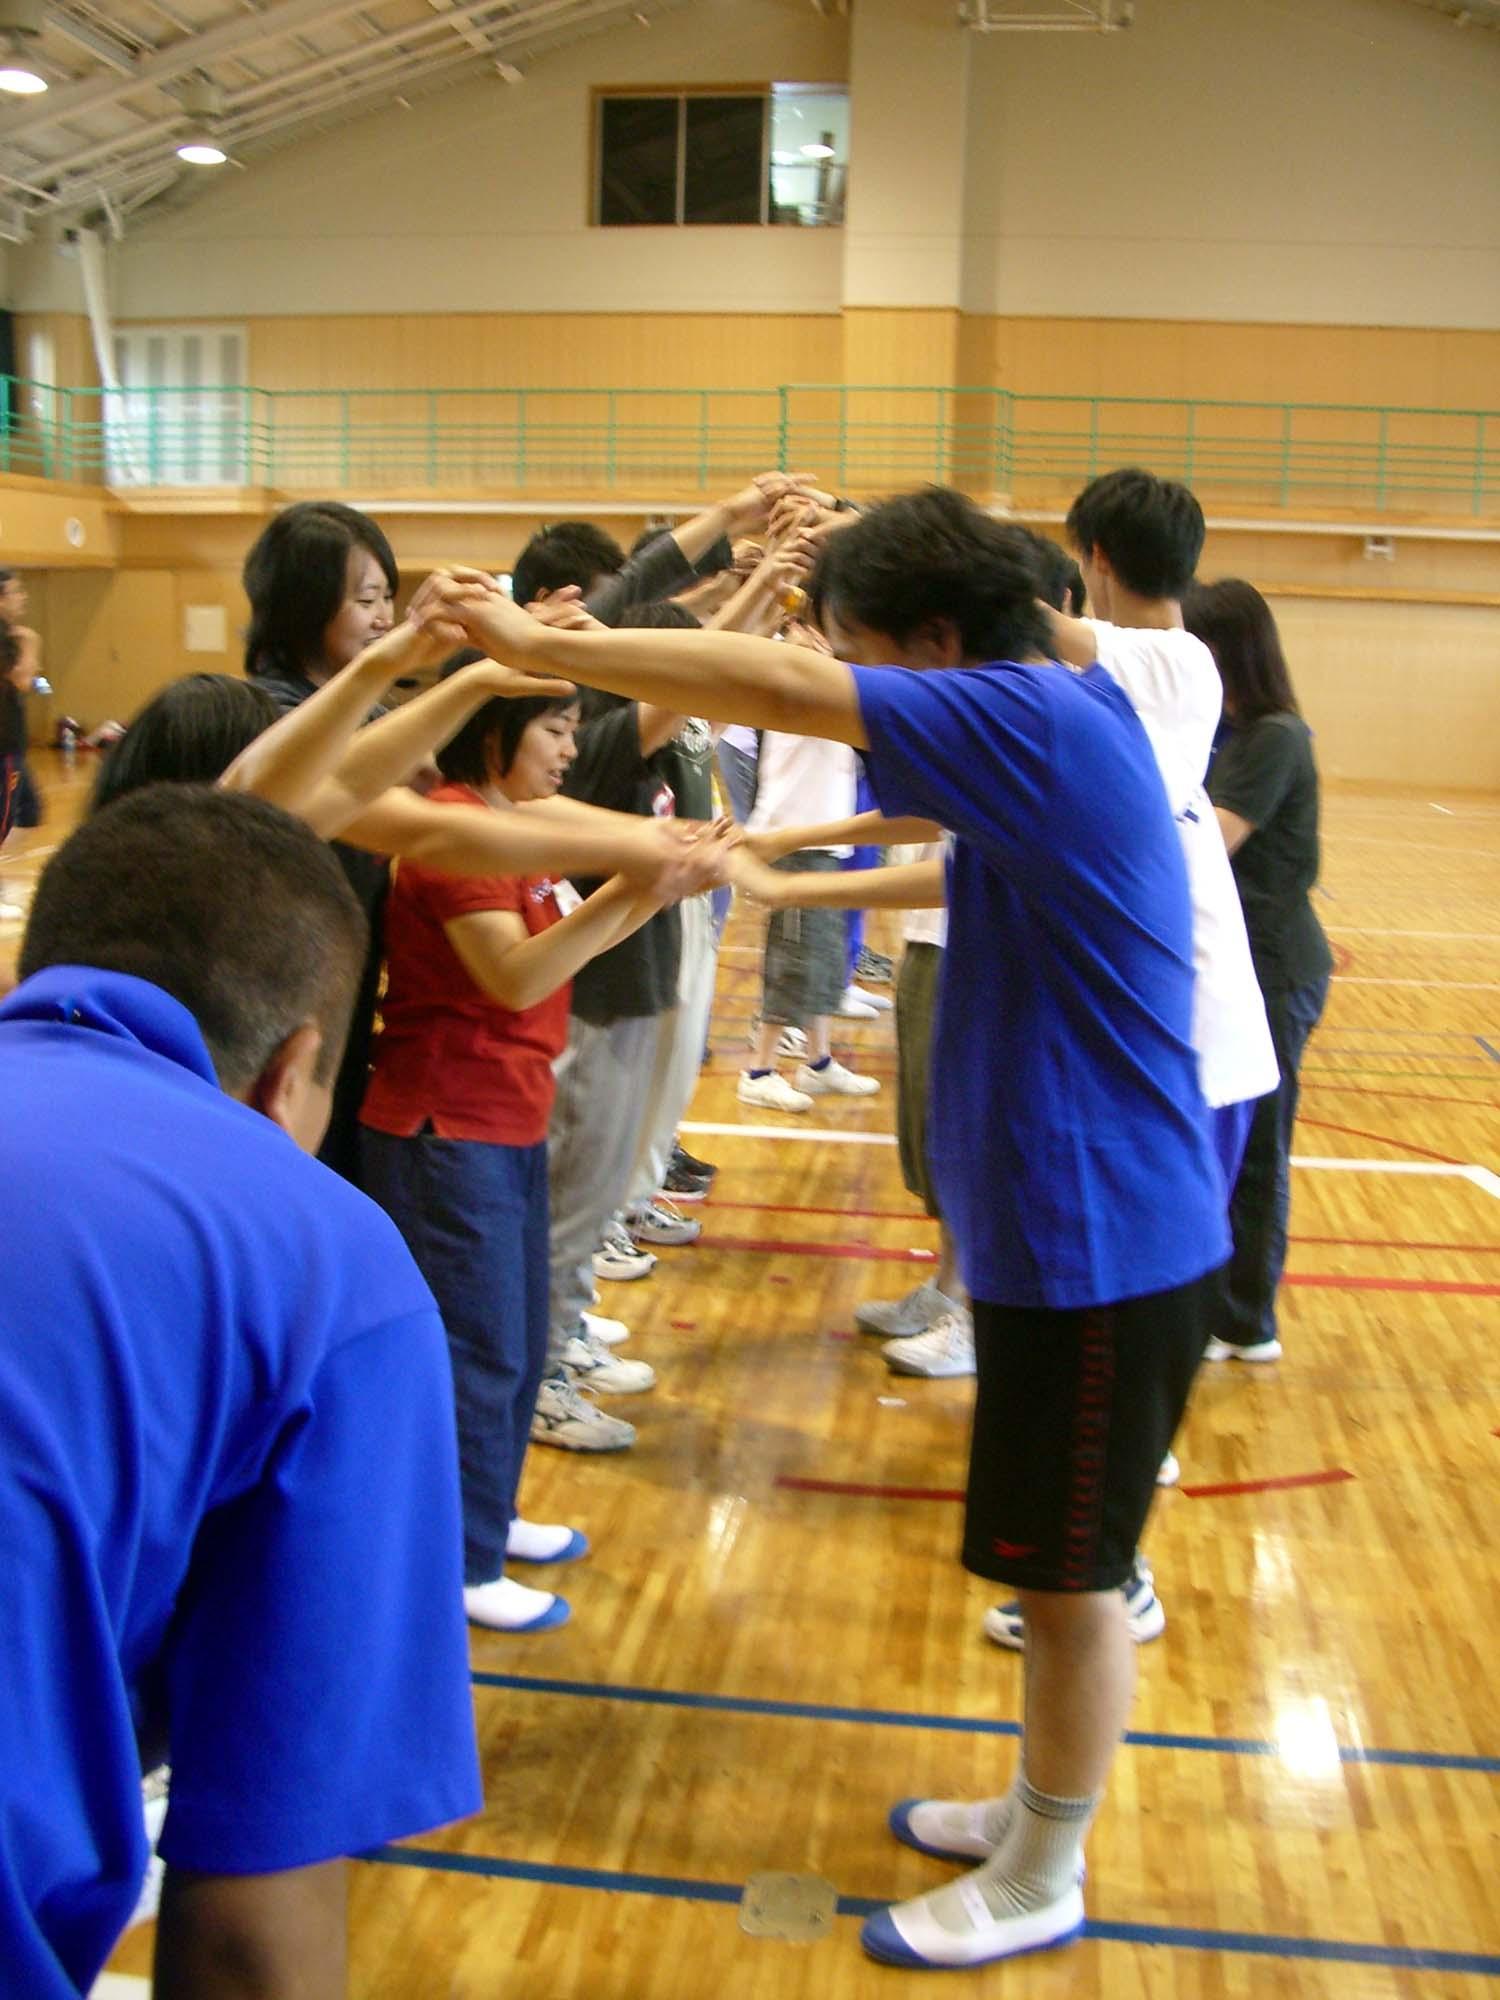 IMGP2547 - 地域支援事業・・・小平市スポーツ教室 〜小平手をつなぐ親の会との協同企画です〜